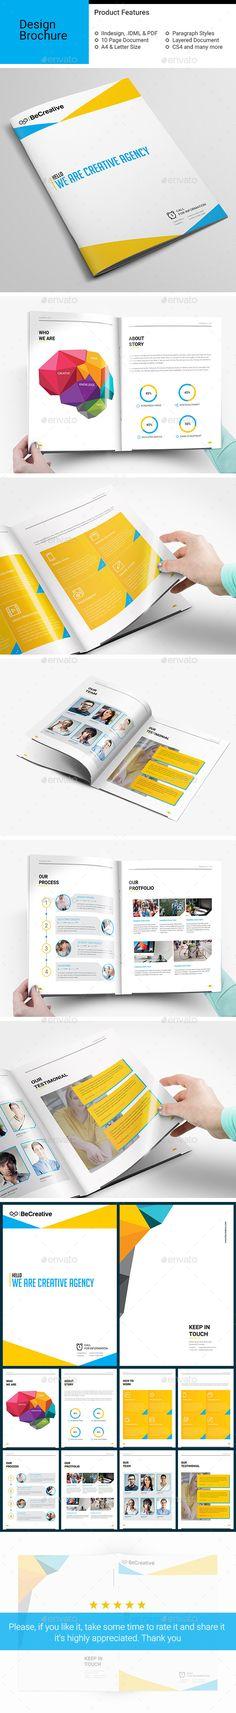 Corporate Brochure Template InDesign INDD #design Download: http://graphicriver.net/item/corporate-brochurev06/13231042?ref=ksioks